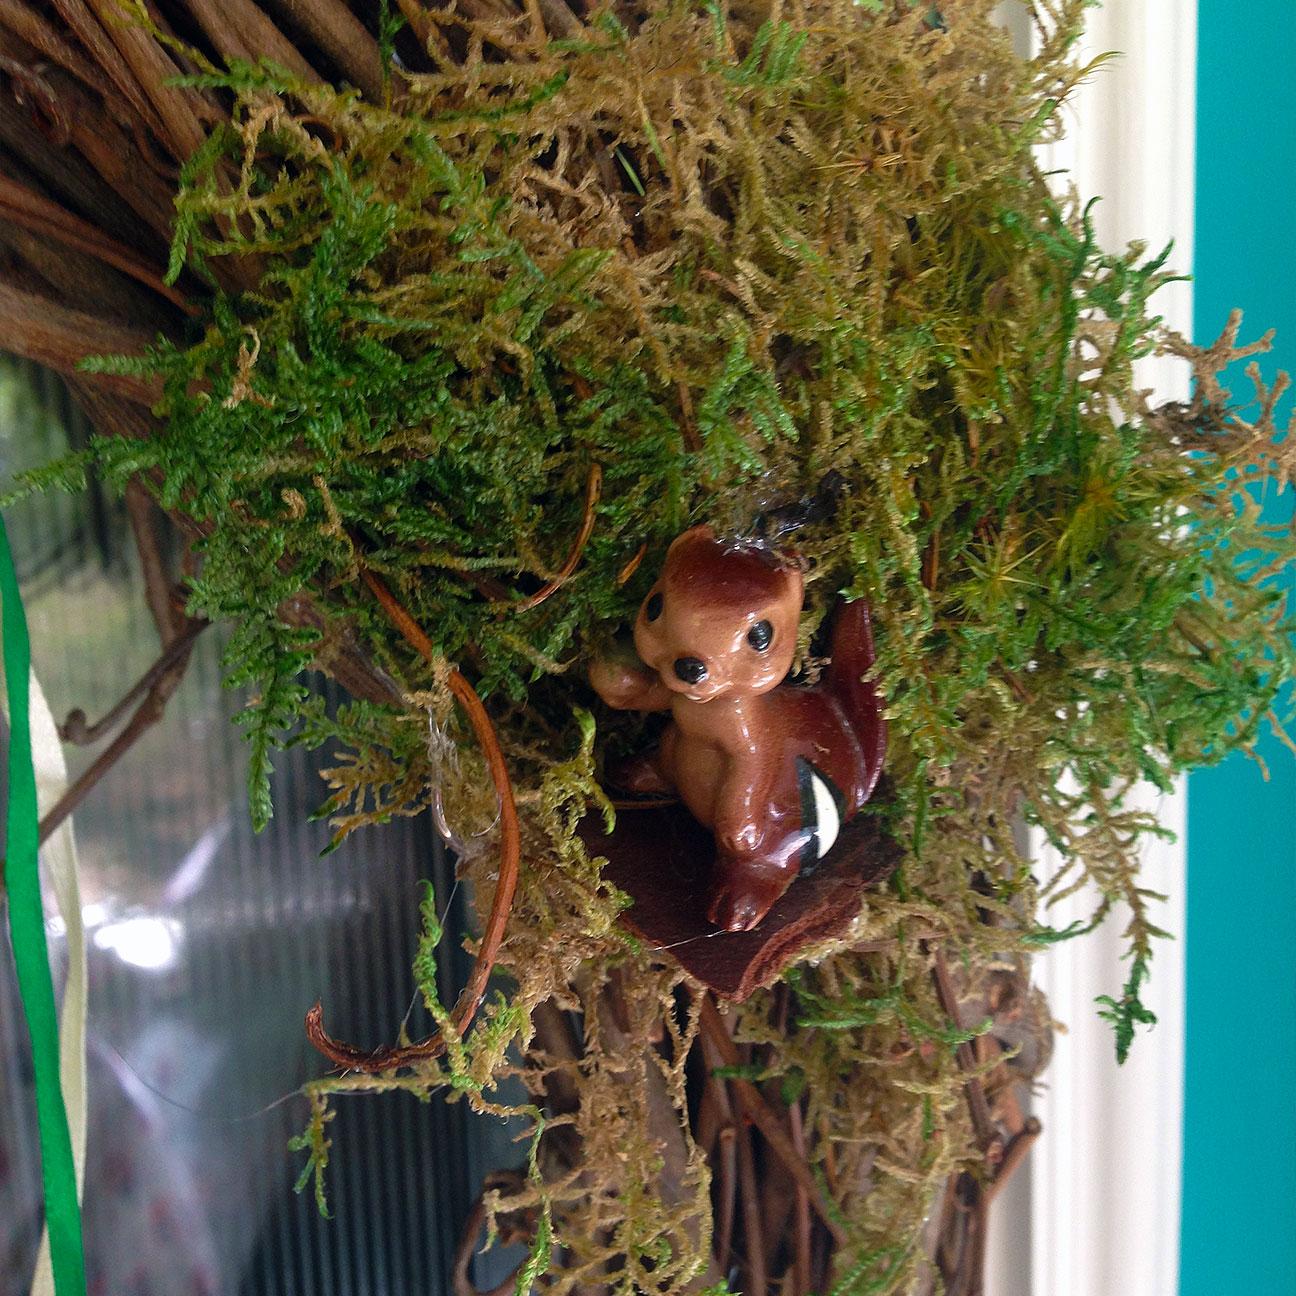 Squirrel (or Chipmunk)